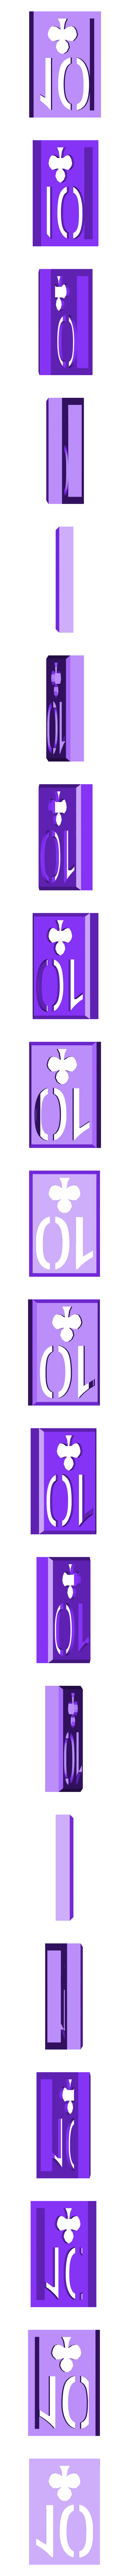 BlockClubs10.stl Download STL file Playing Card Tiles • Object to 3D print, Jinja